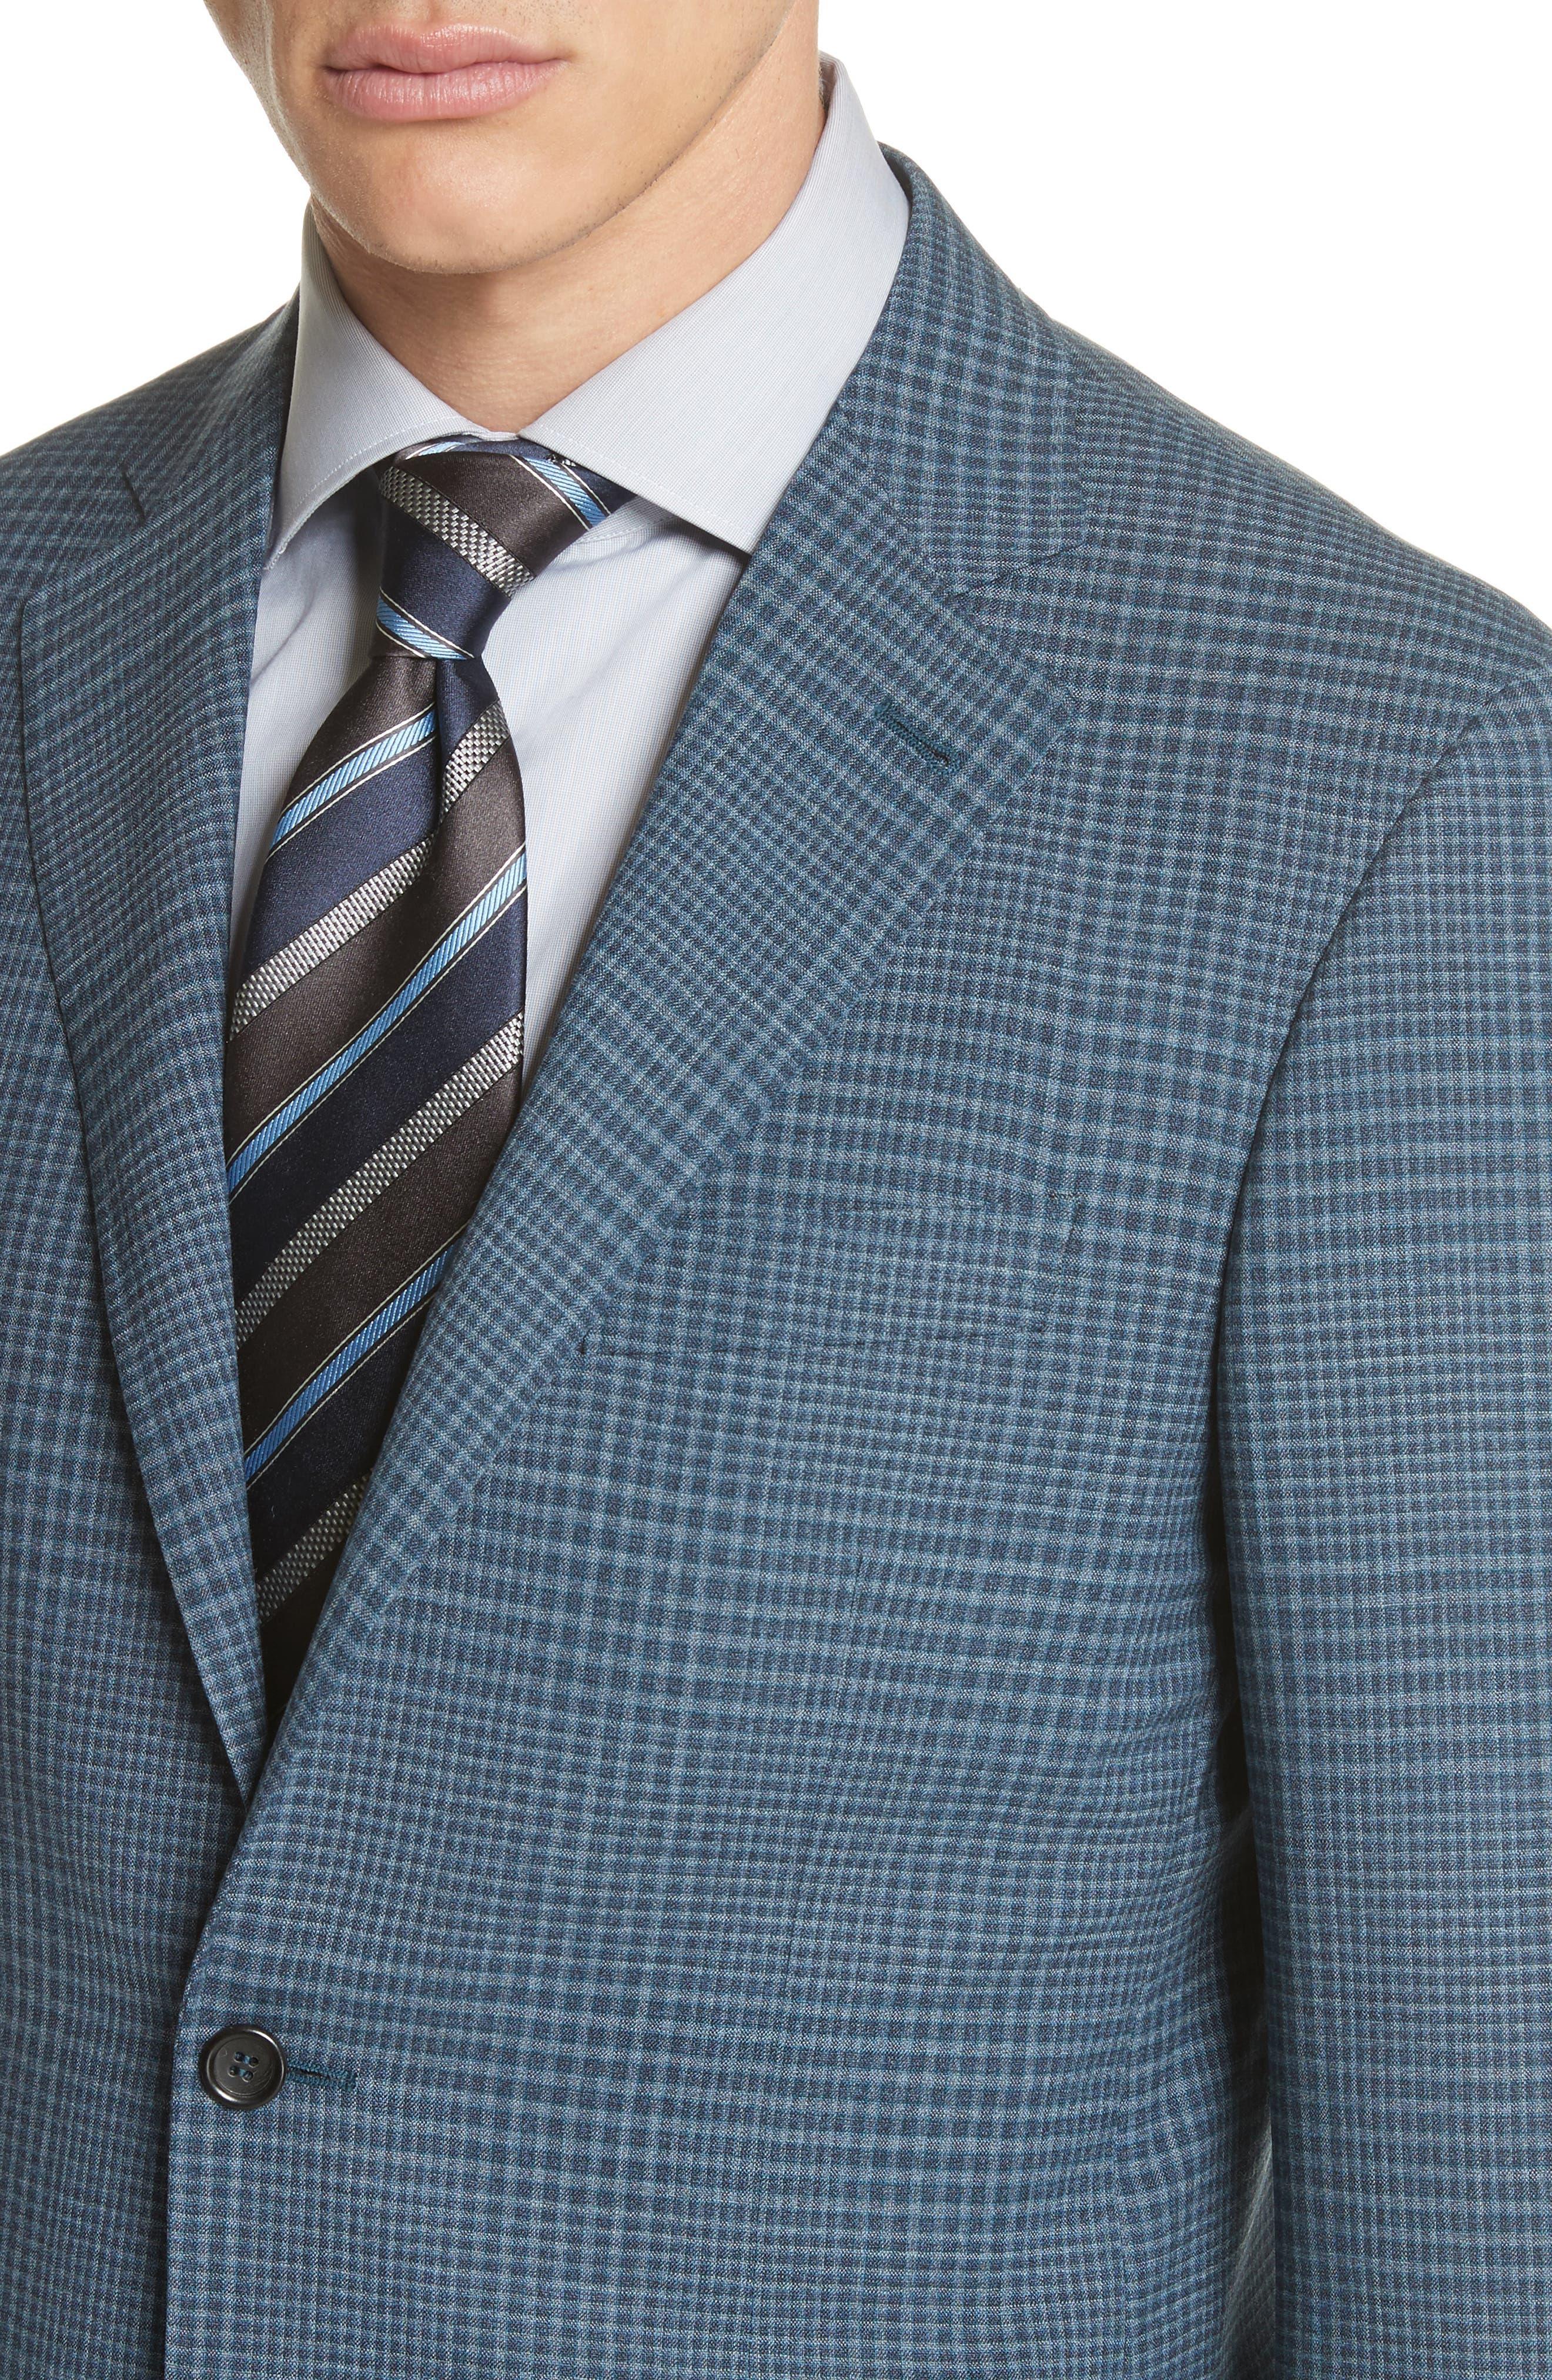 Kei Classic Fit Plaid Wool Sport Coat,                             Alternate thumbnail 4, color,                             400